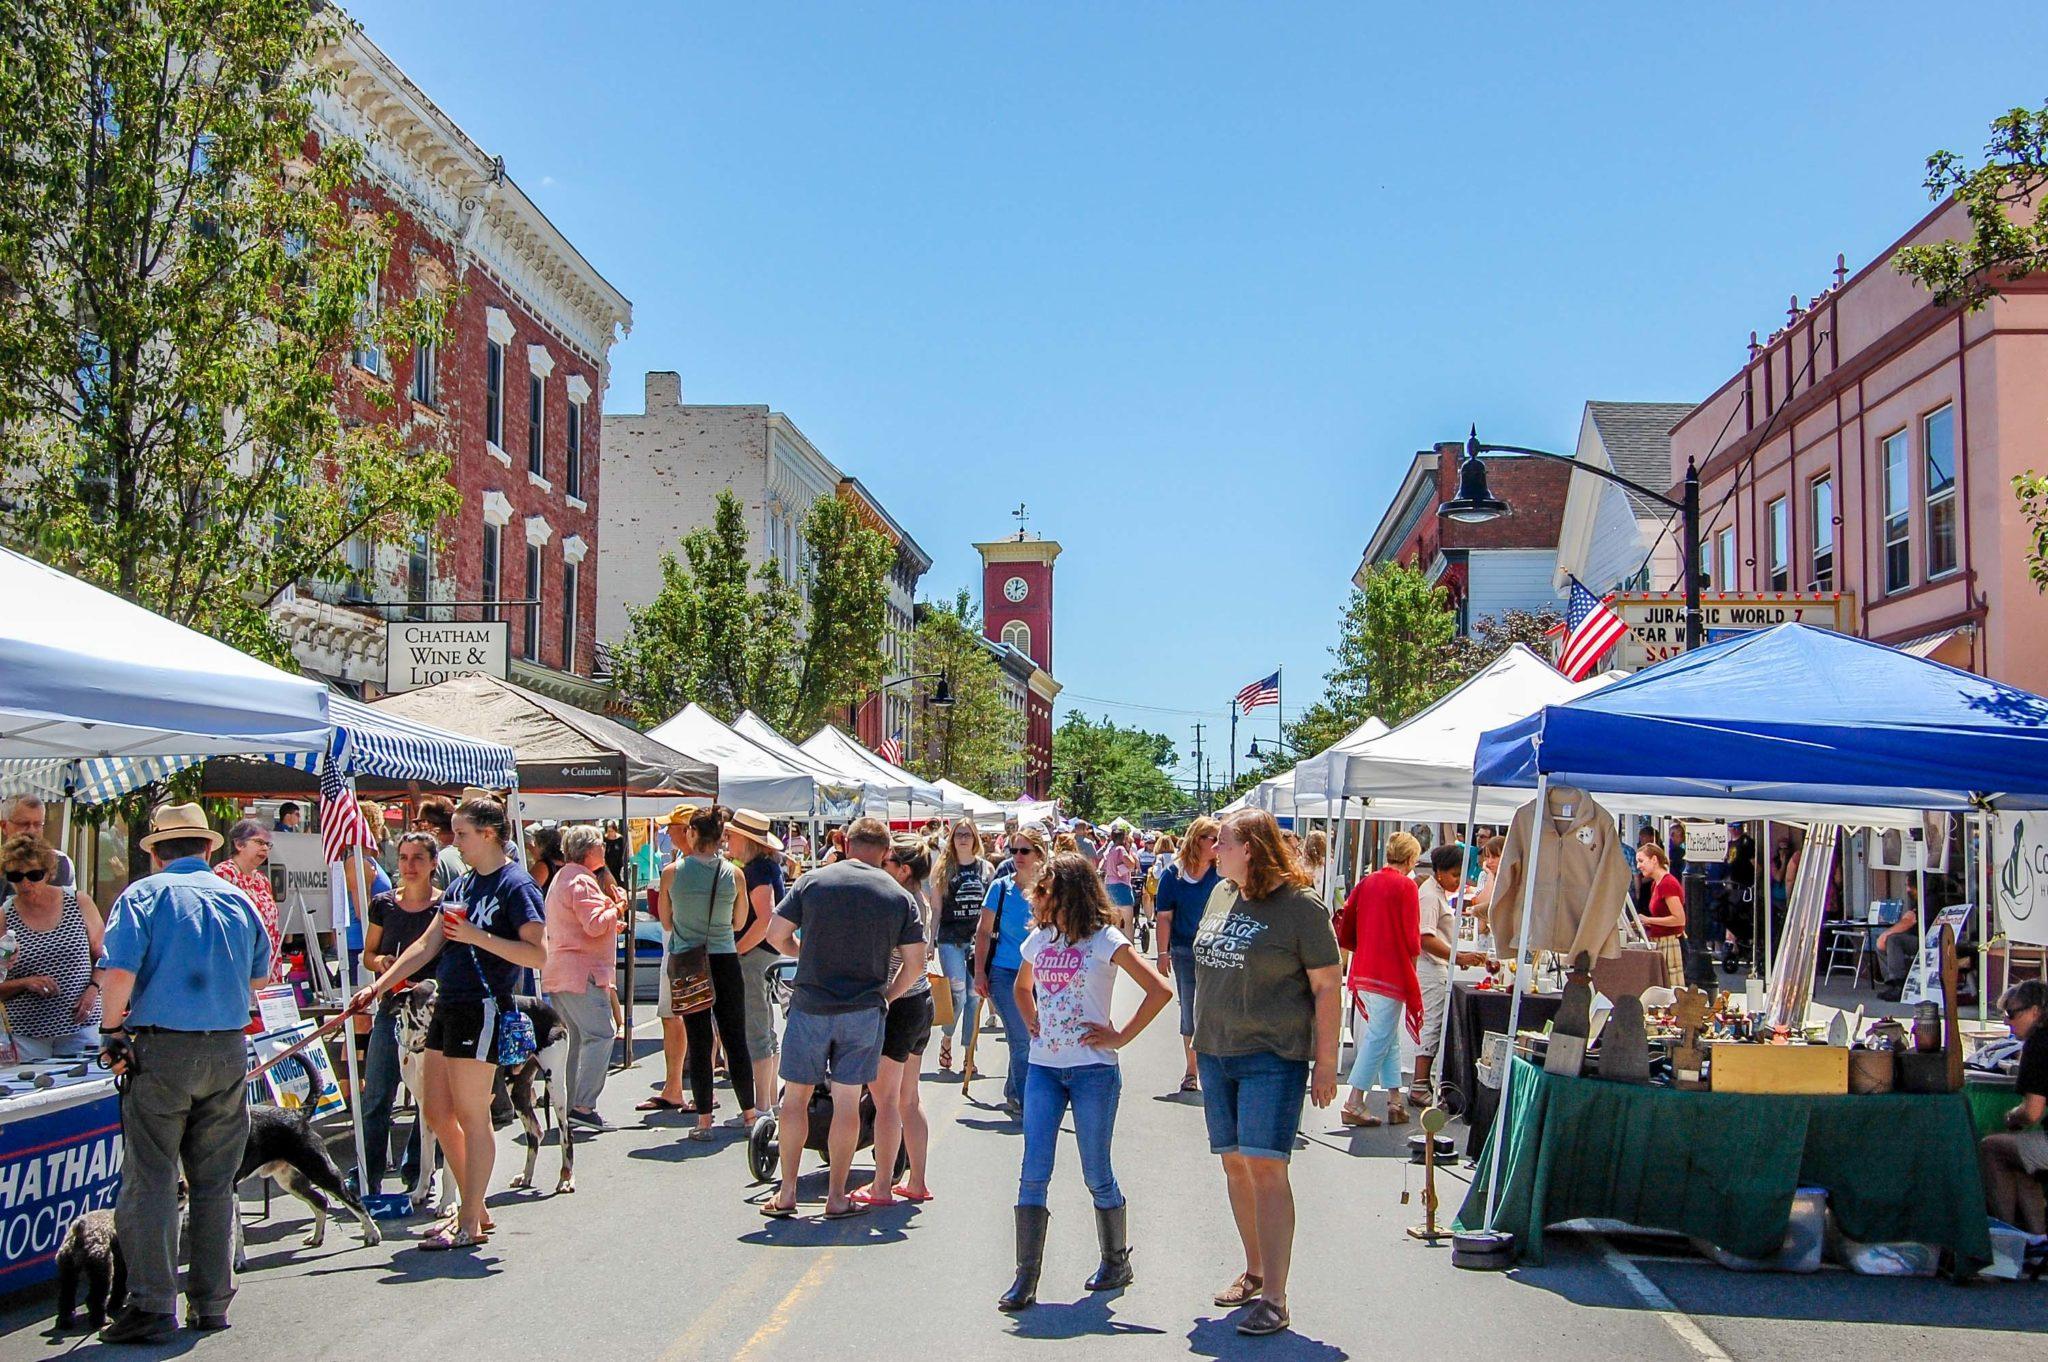 Photo of Chatham Summerfest 2018 by Seth Davis